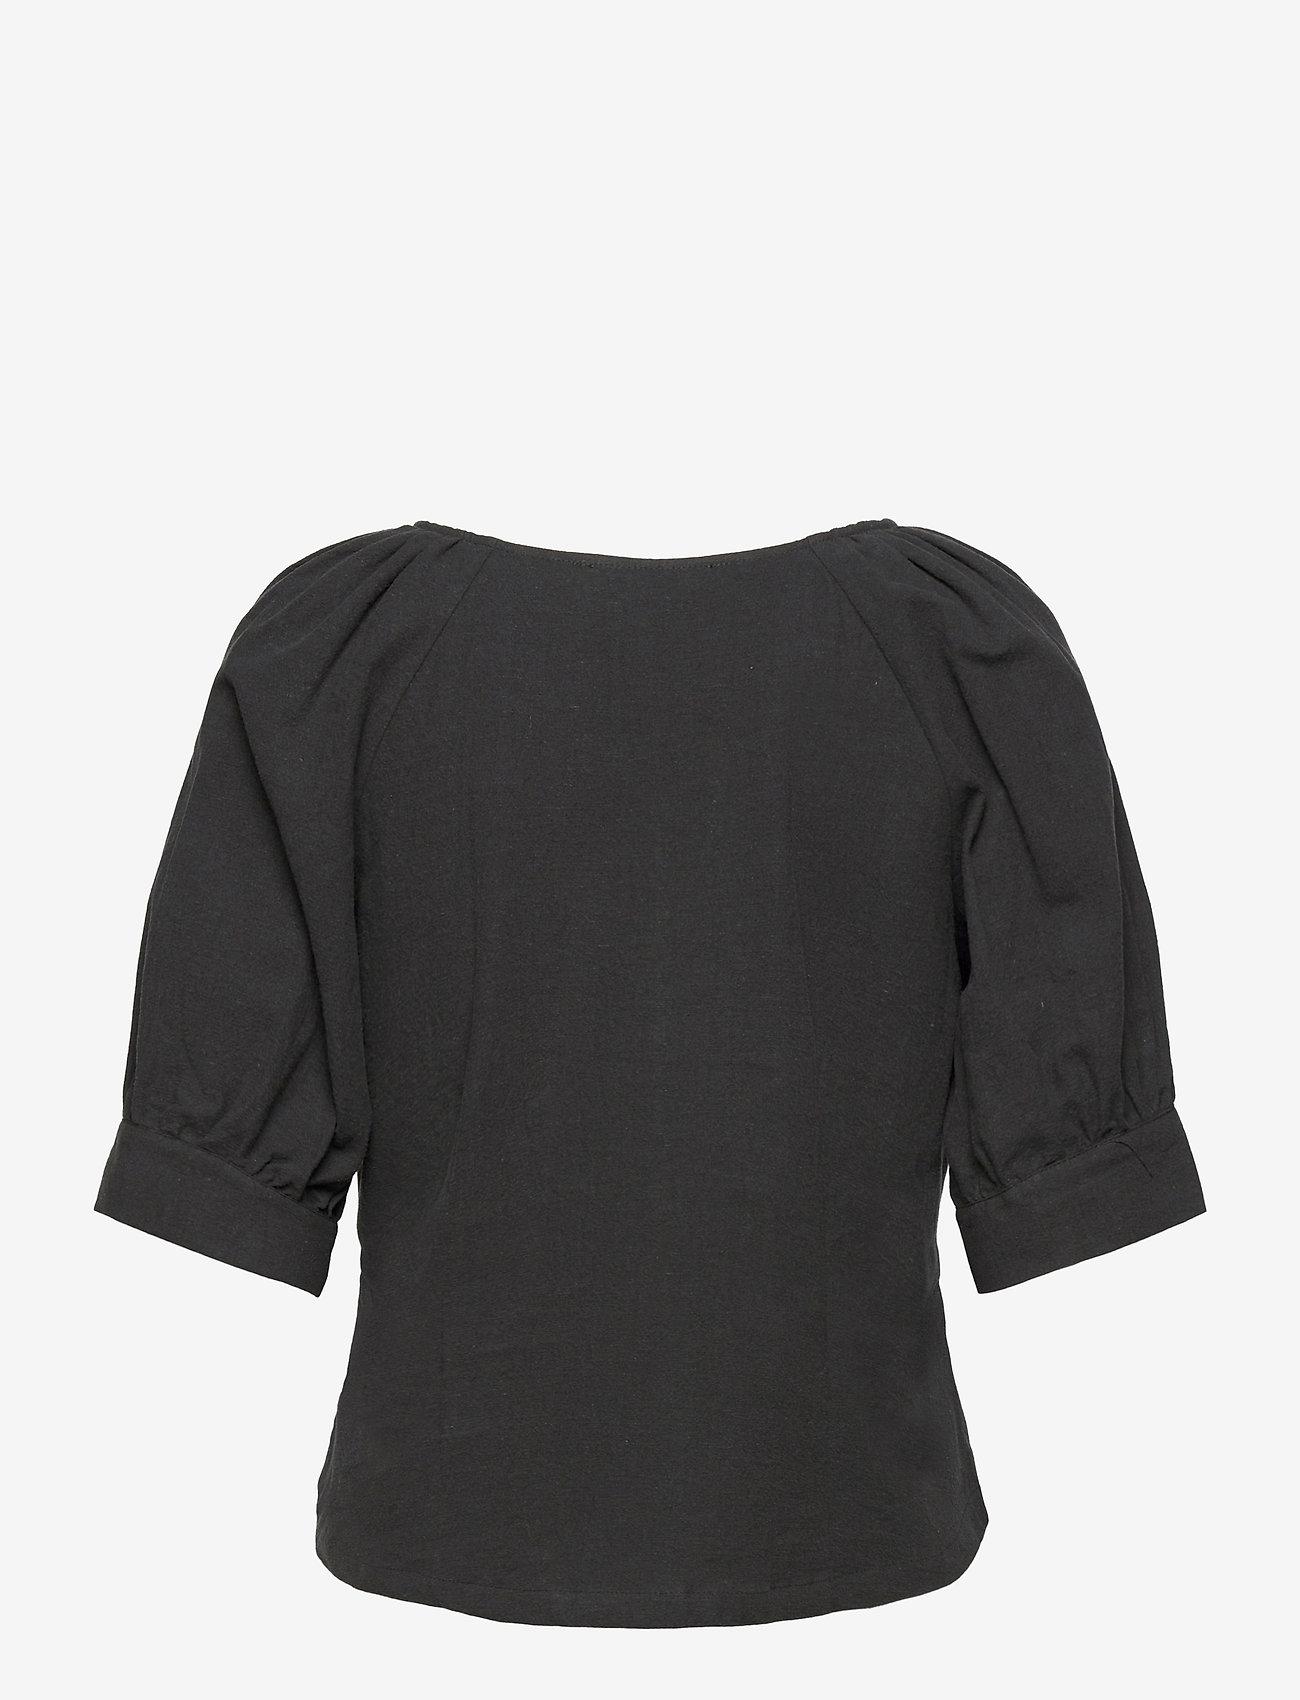 Selected Femme - SLFMALVINA 2/4 SHIRT - kurzämlige blusen - black - 1